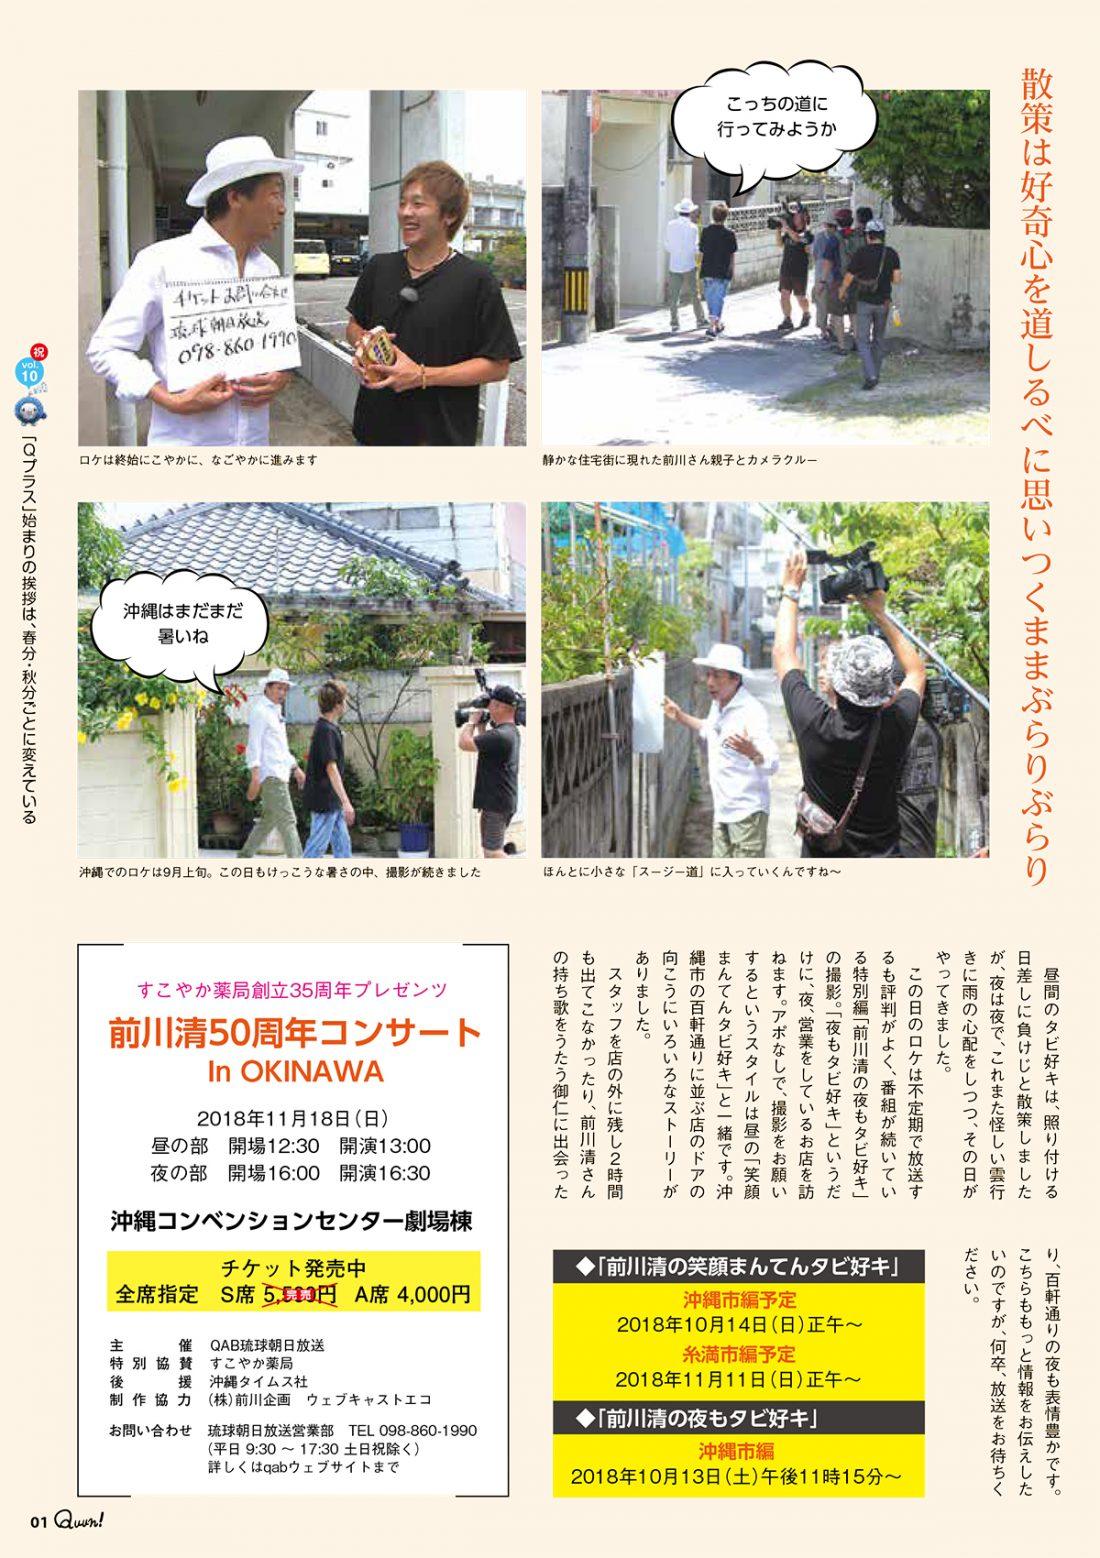 http://www.qab.co.jp/qgoro/wp-content/uploads/quun_1003-1100x1558.jpg